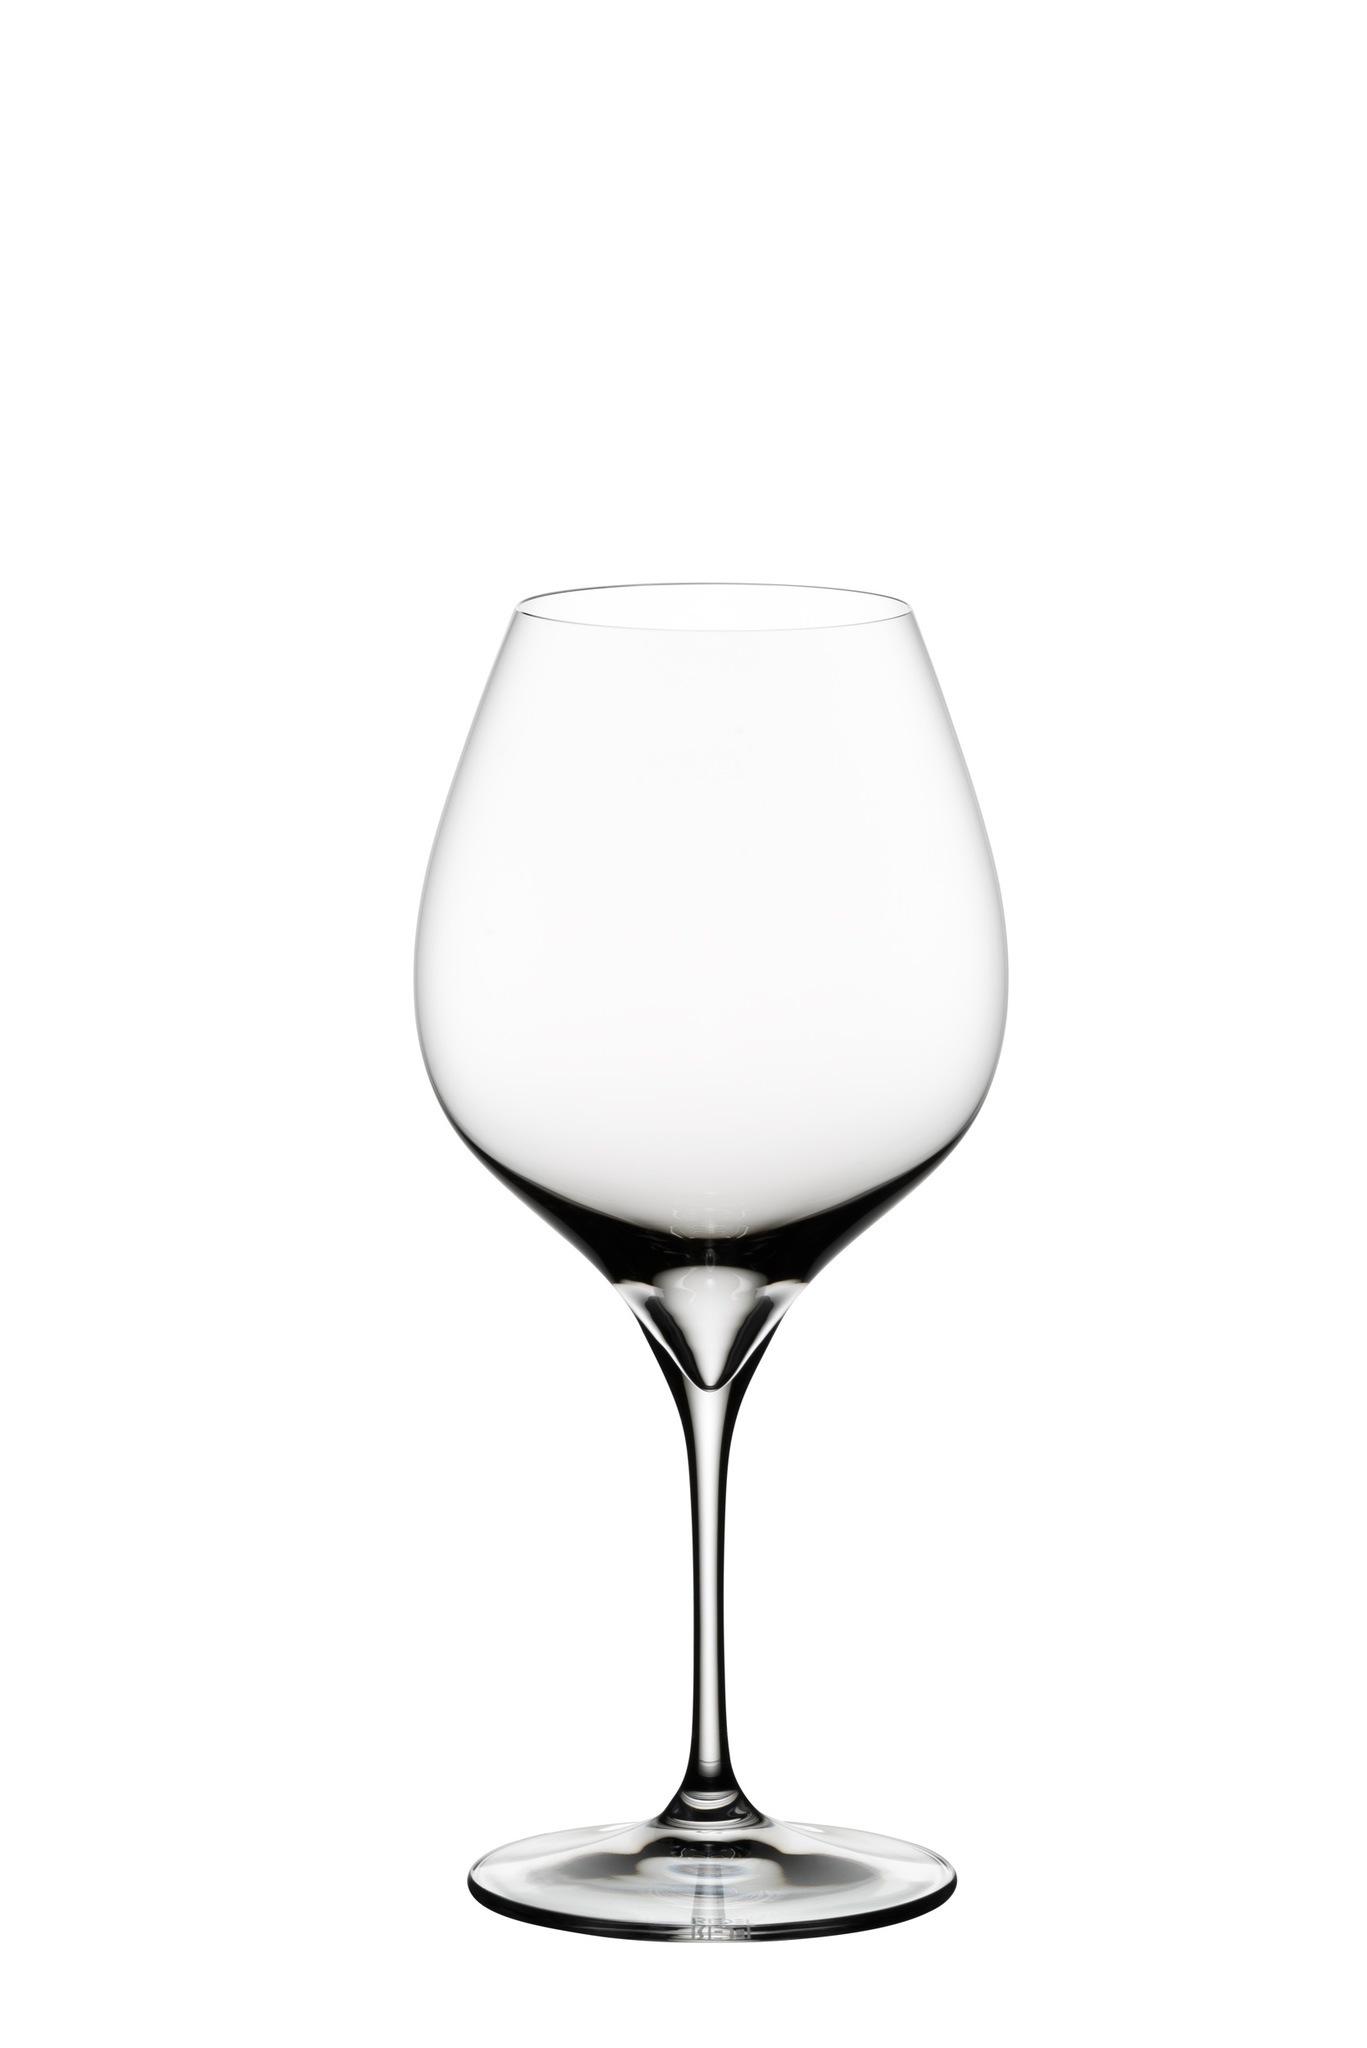 Набор из 2-х бокалов для вина Riedel Pinot Noir/Nebbiolo, Grape, 700 мл riedel набор бокалов для красного вина pinot nebbiolo 690 мл 2 шт 0414 07 riedel